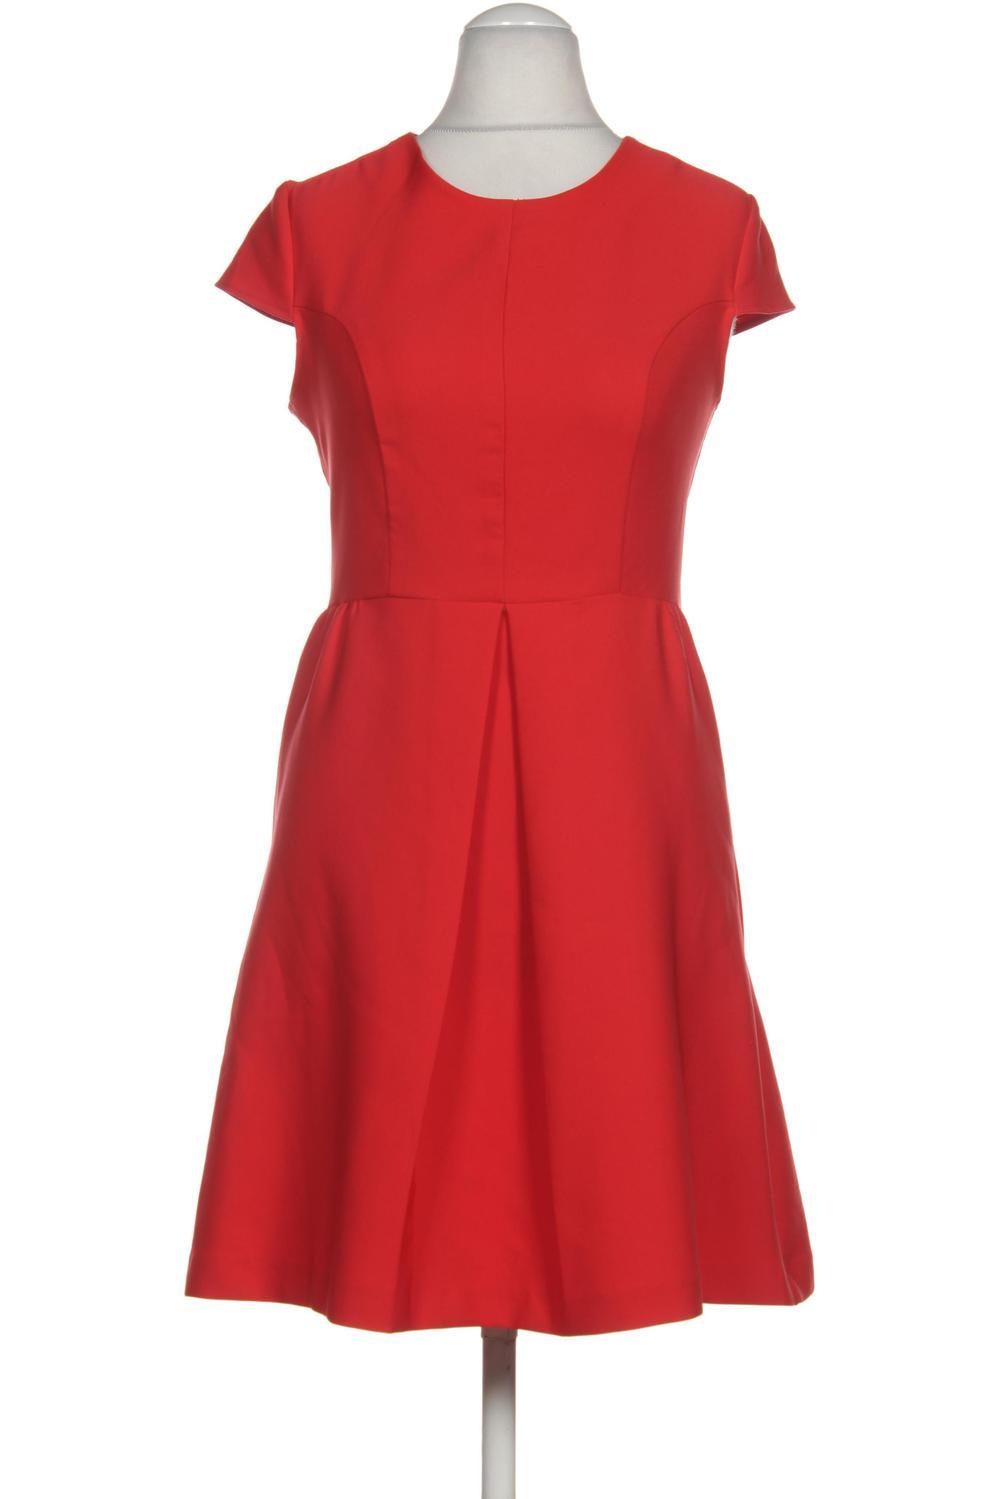 Orsay Kleid Damen Dress Damenkleid Gr. EUR 13 (DE 13) Elasthan rot